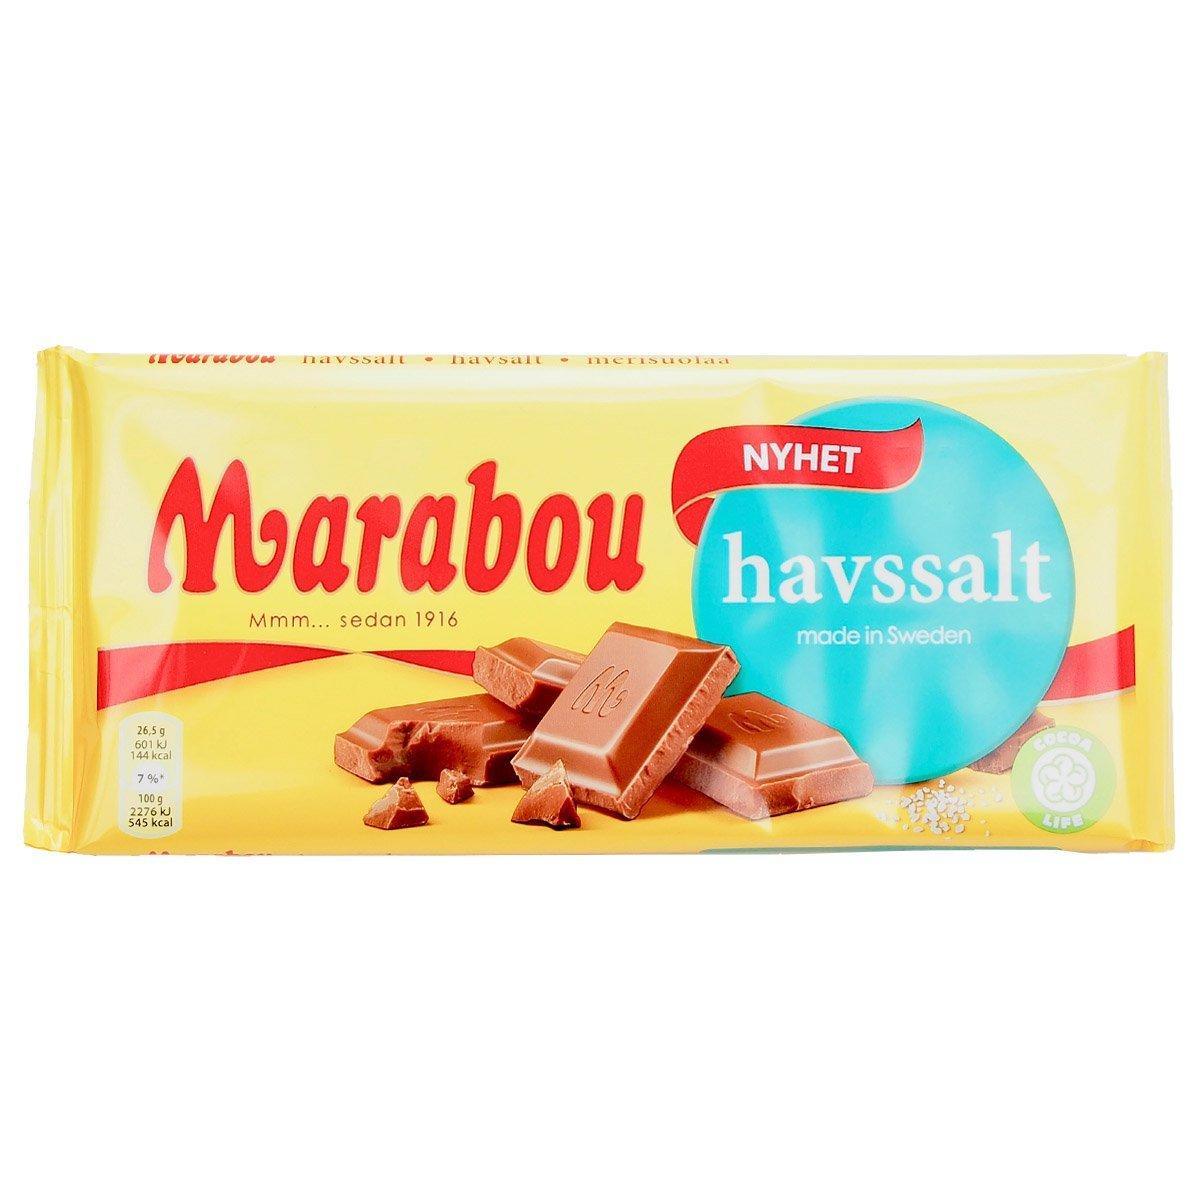 Marabou havssalt (185g) 1